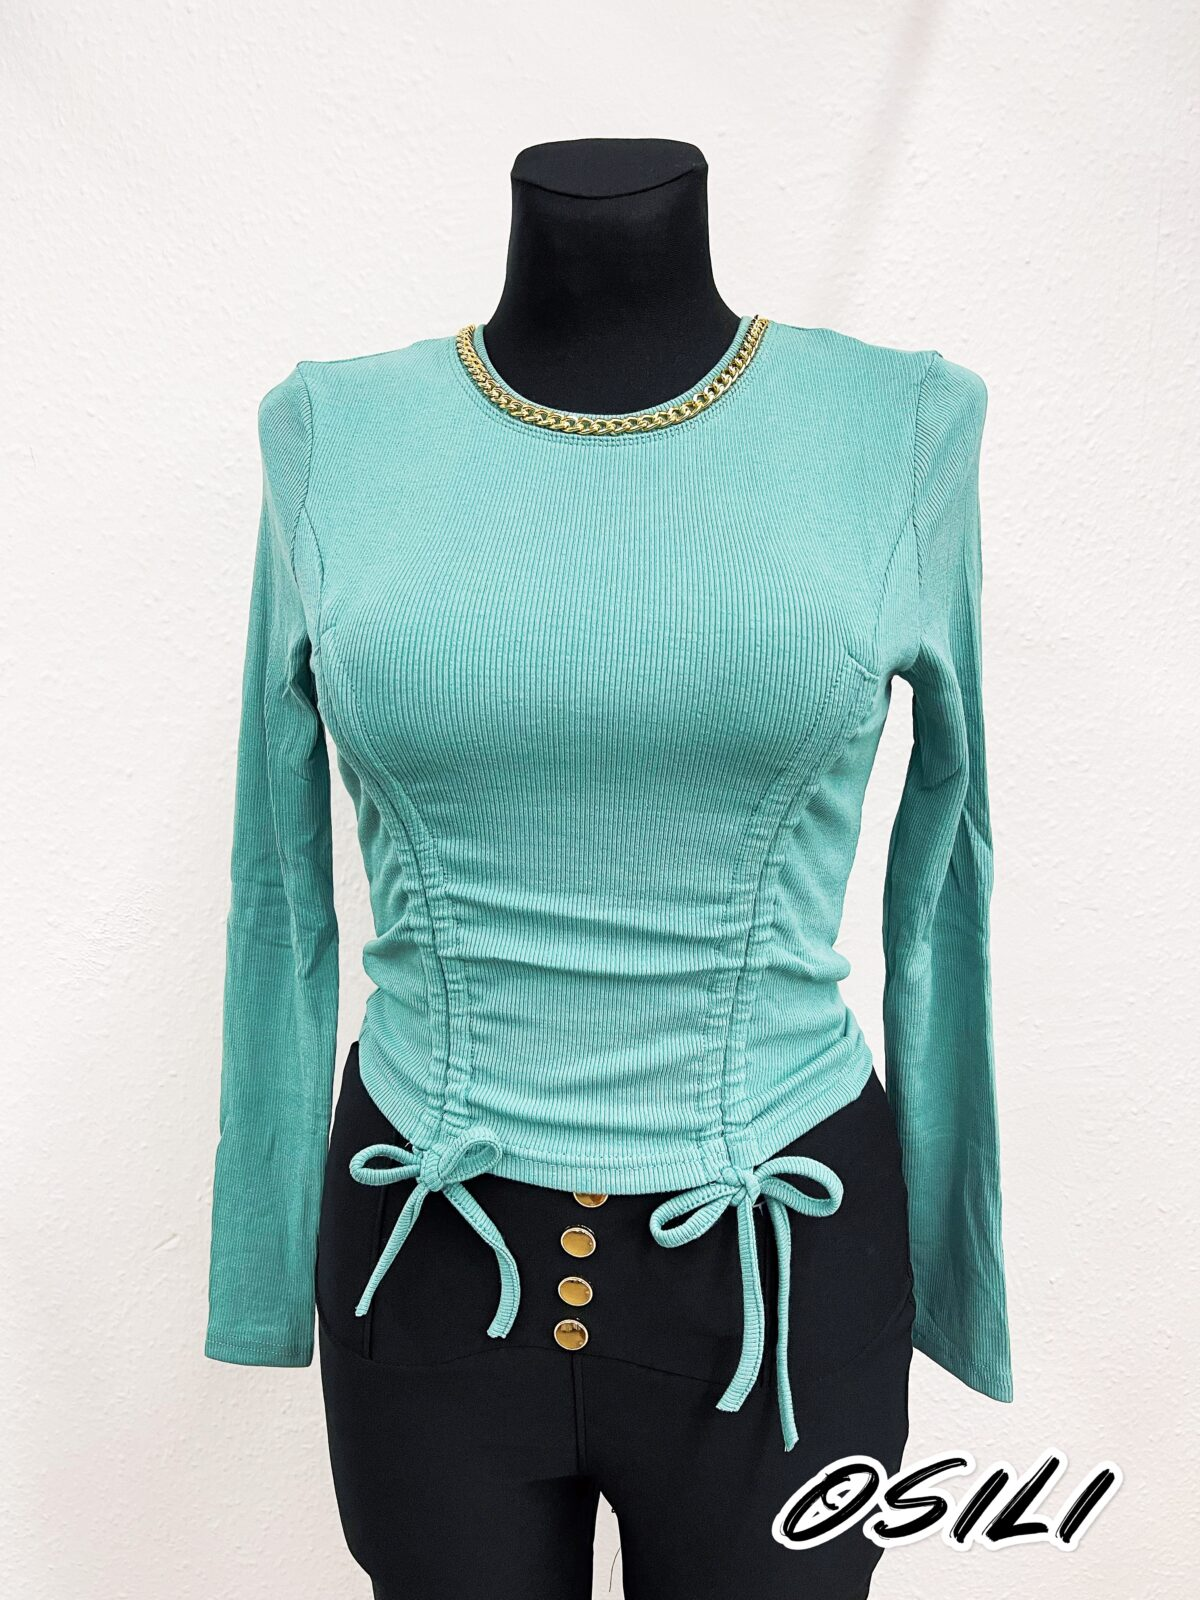 93A154A8 D086 406D 99A6 B58B94F822A3 scaled Osili - Fashion - Divat